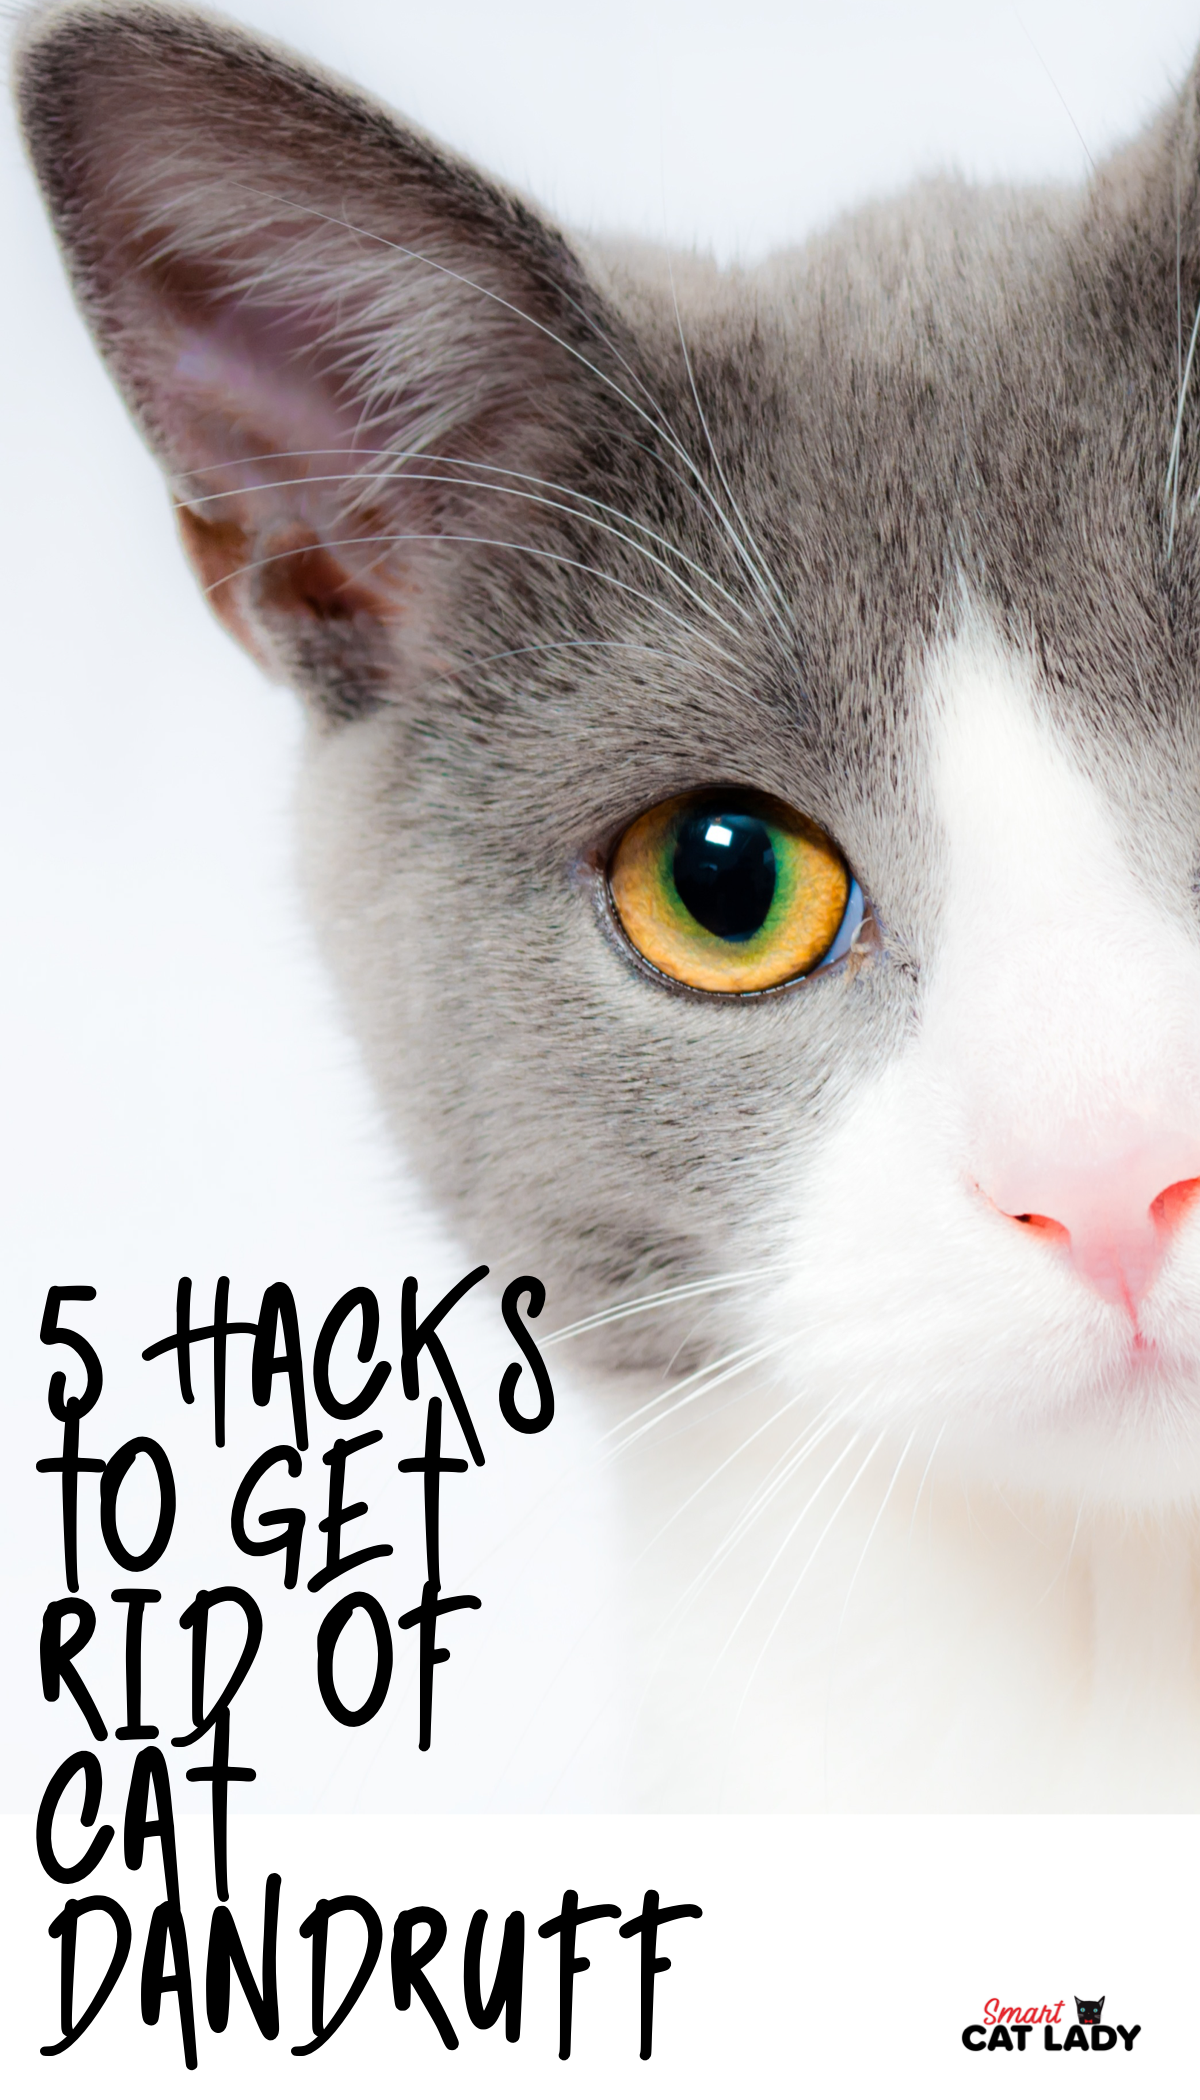 5 Hacks To Get Rid Of Cat Dandruff In 2020 Cat Dandruff Cat Shampoo Cats